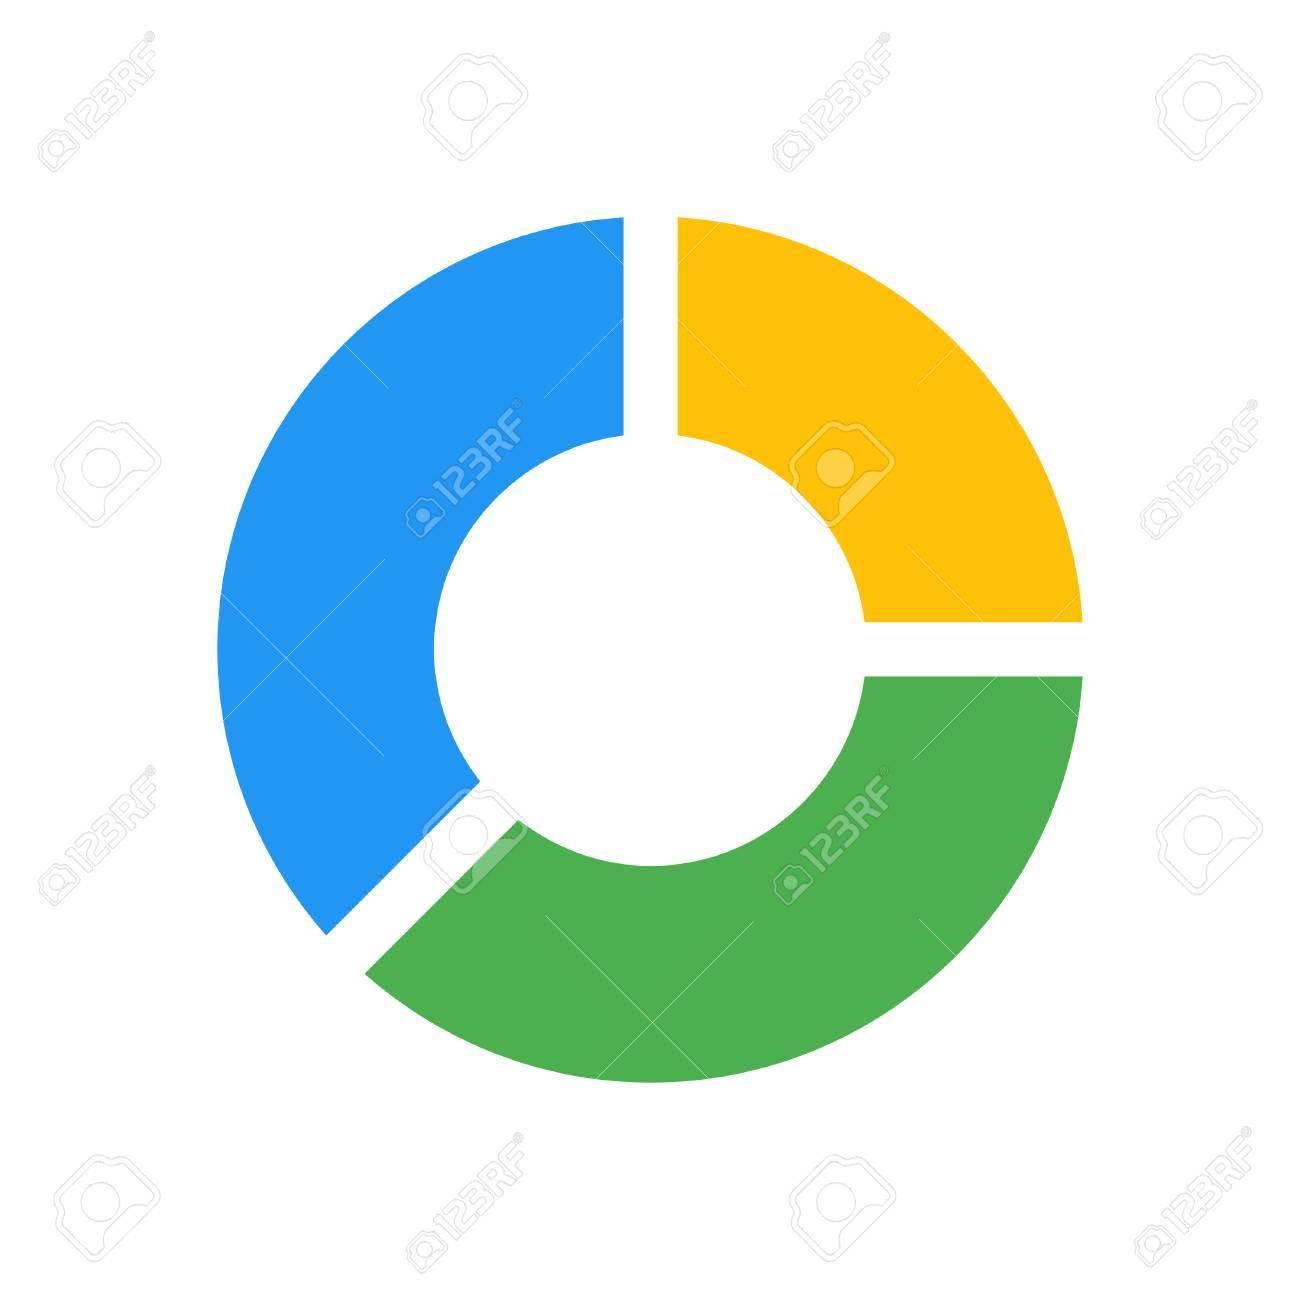 separate doughnut chart